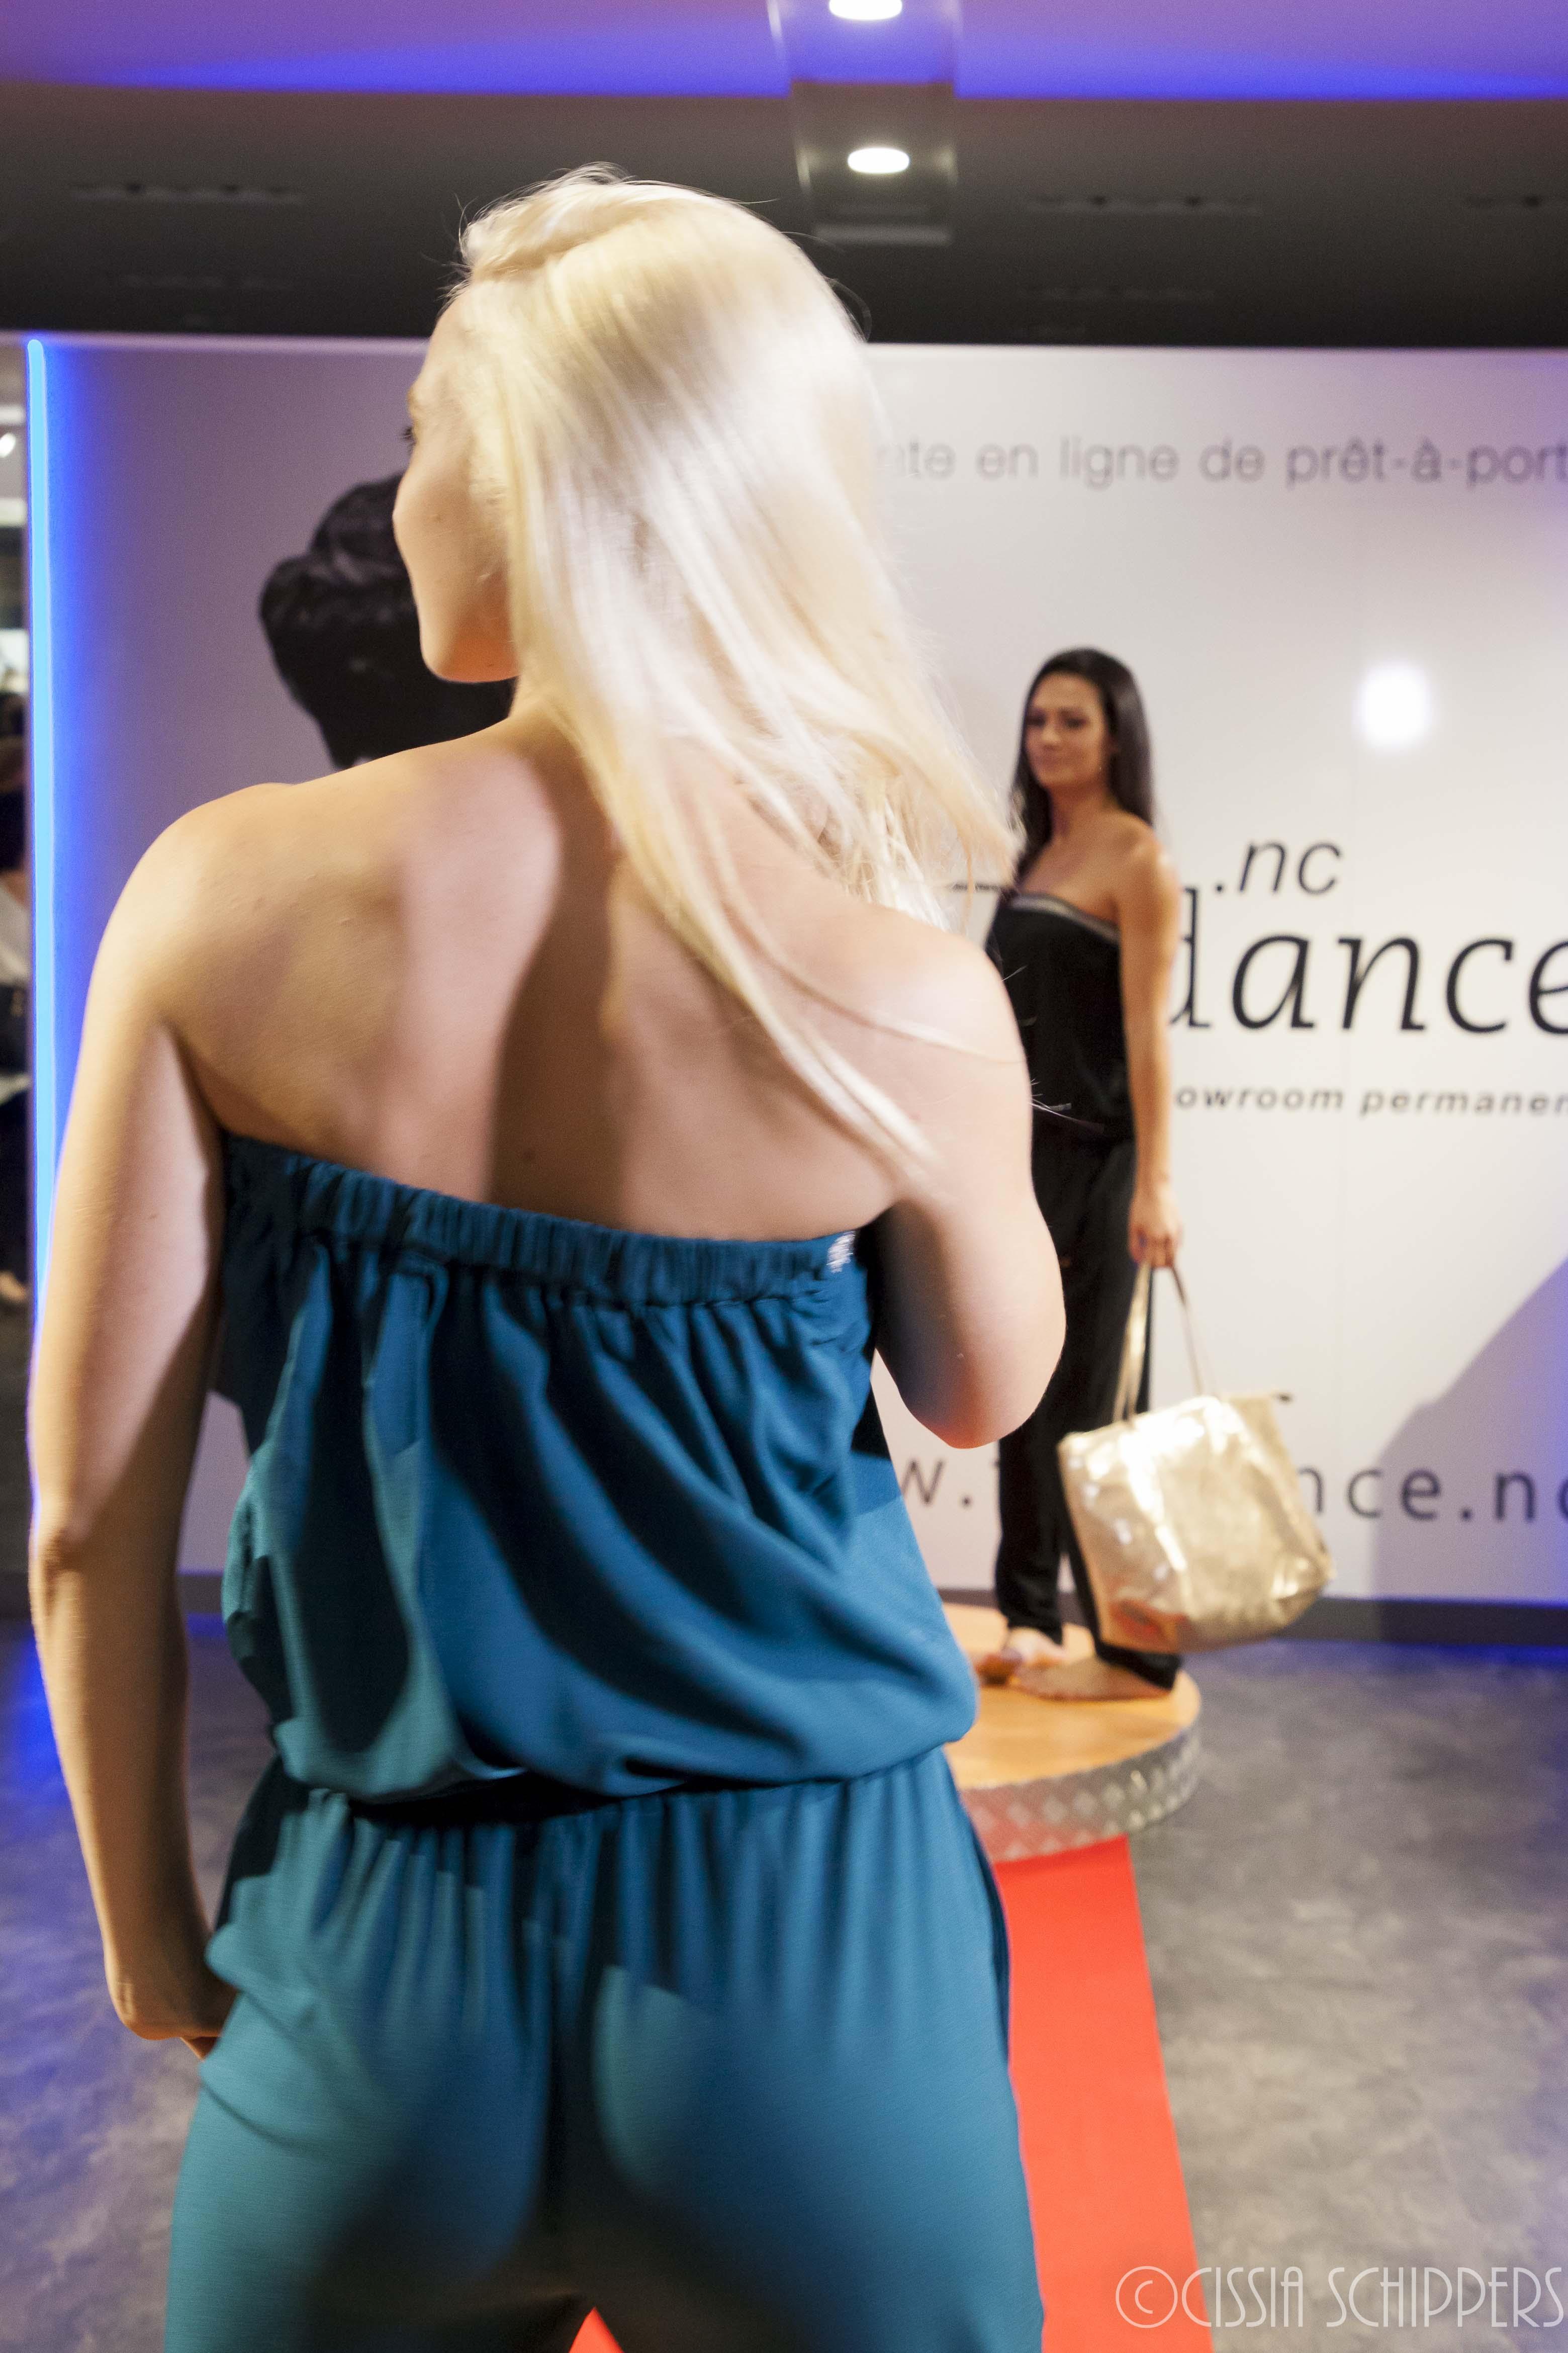 Tendance NC 2017 by Cissia Schippers photographe-8037